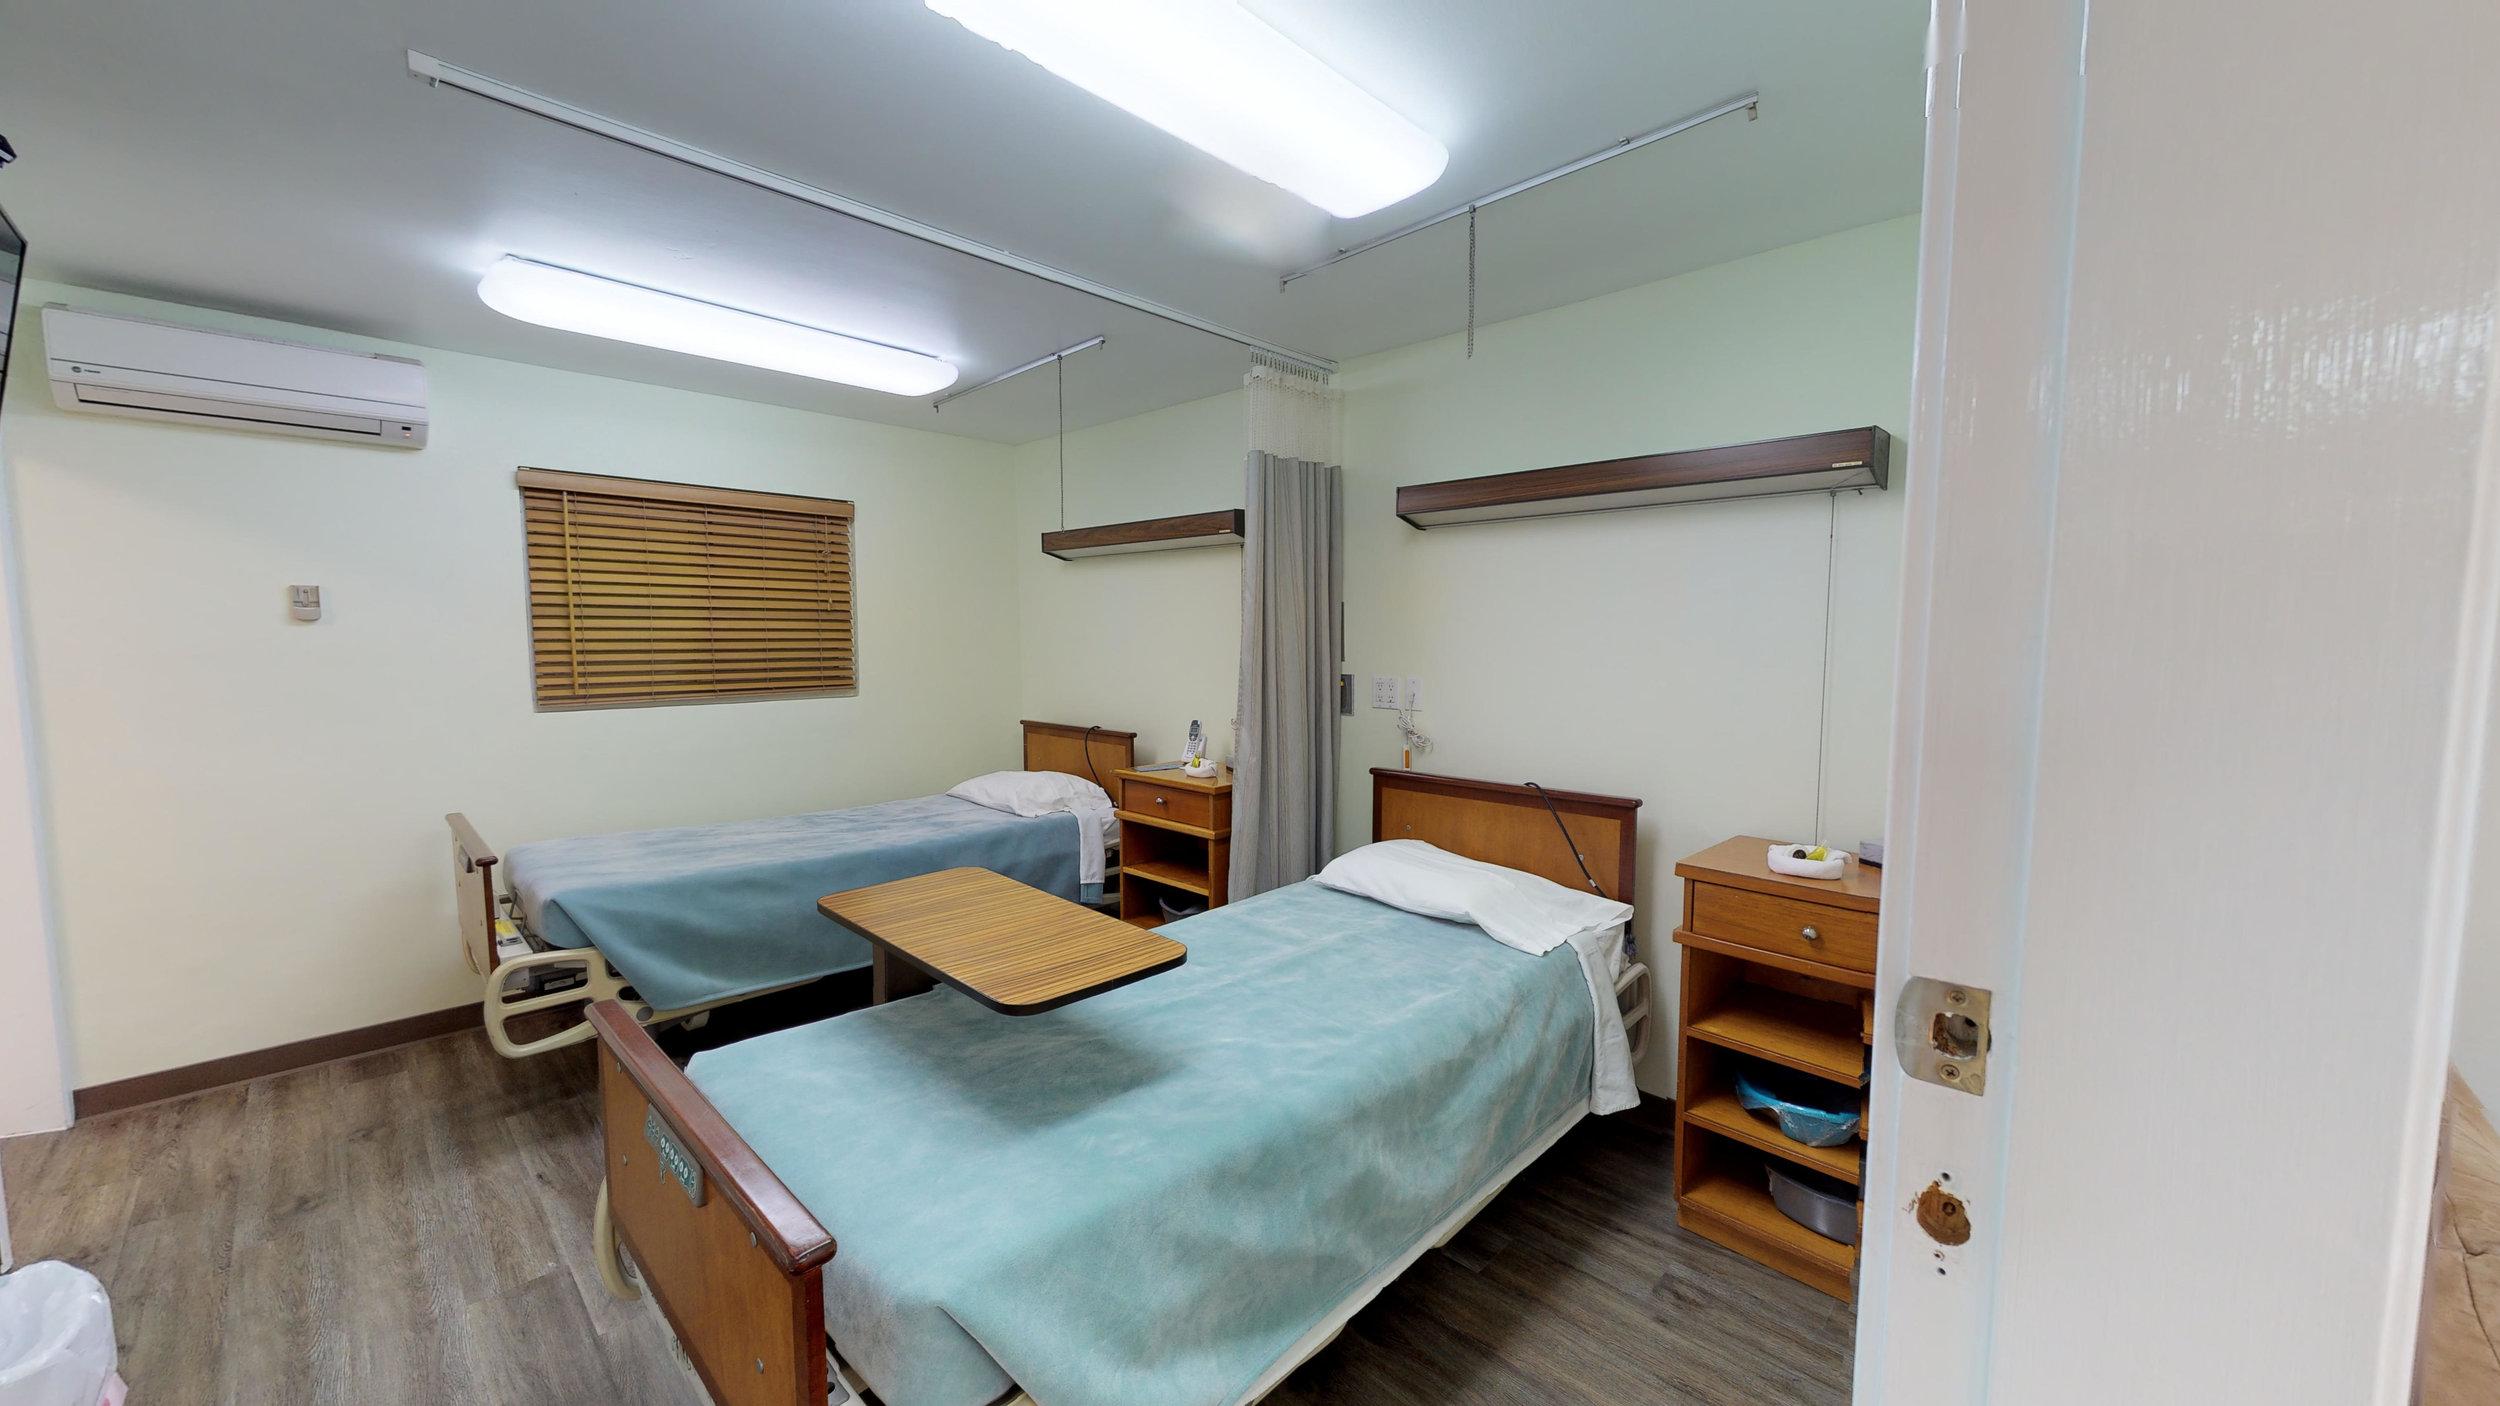 International-Bio-Care-Hospital-05082019_134153.jpg